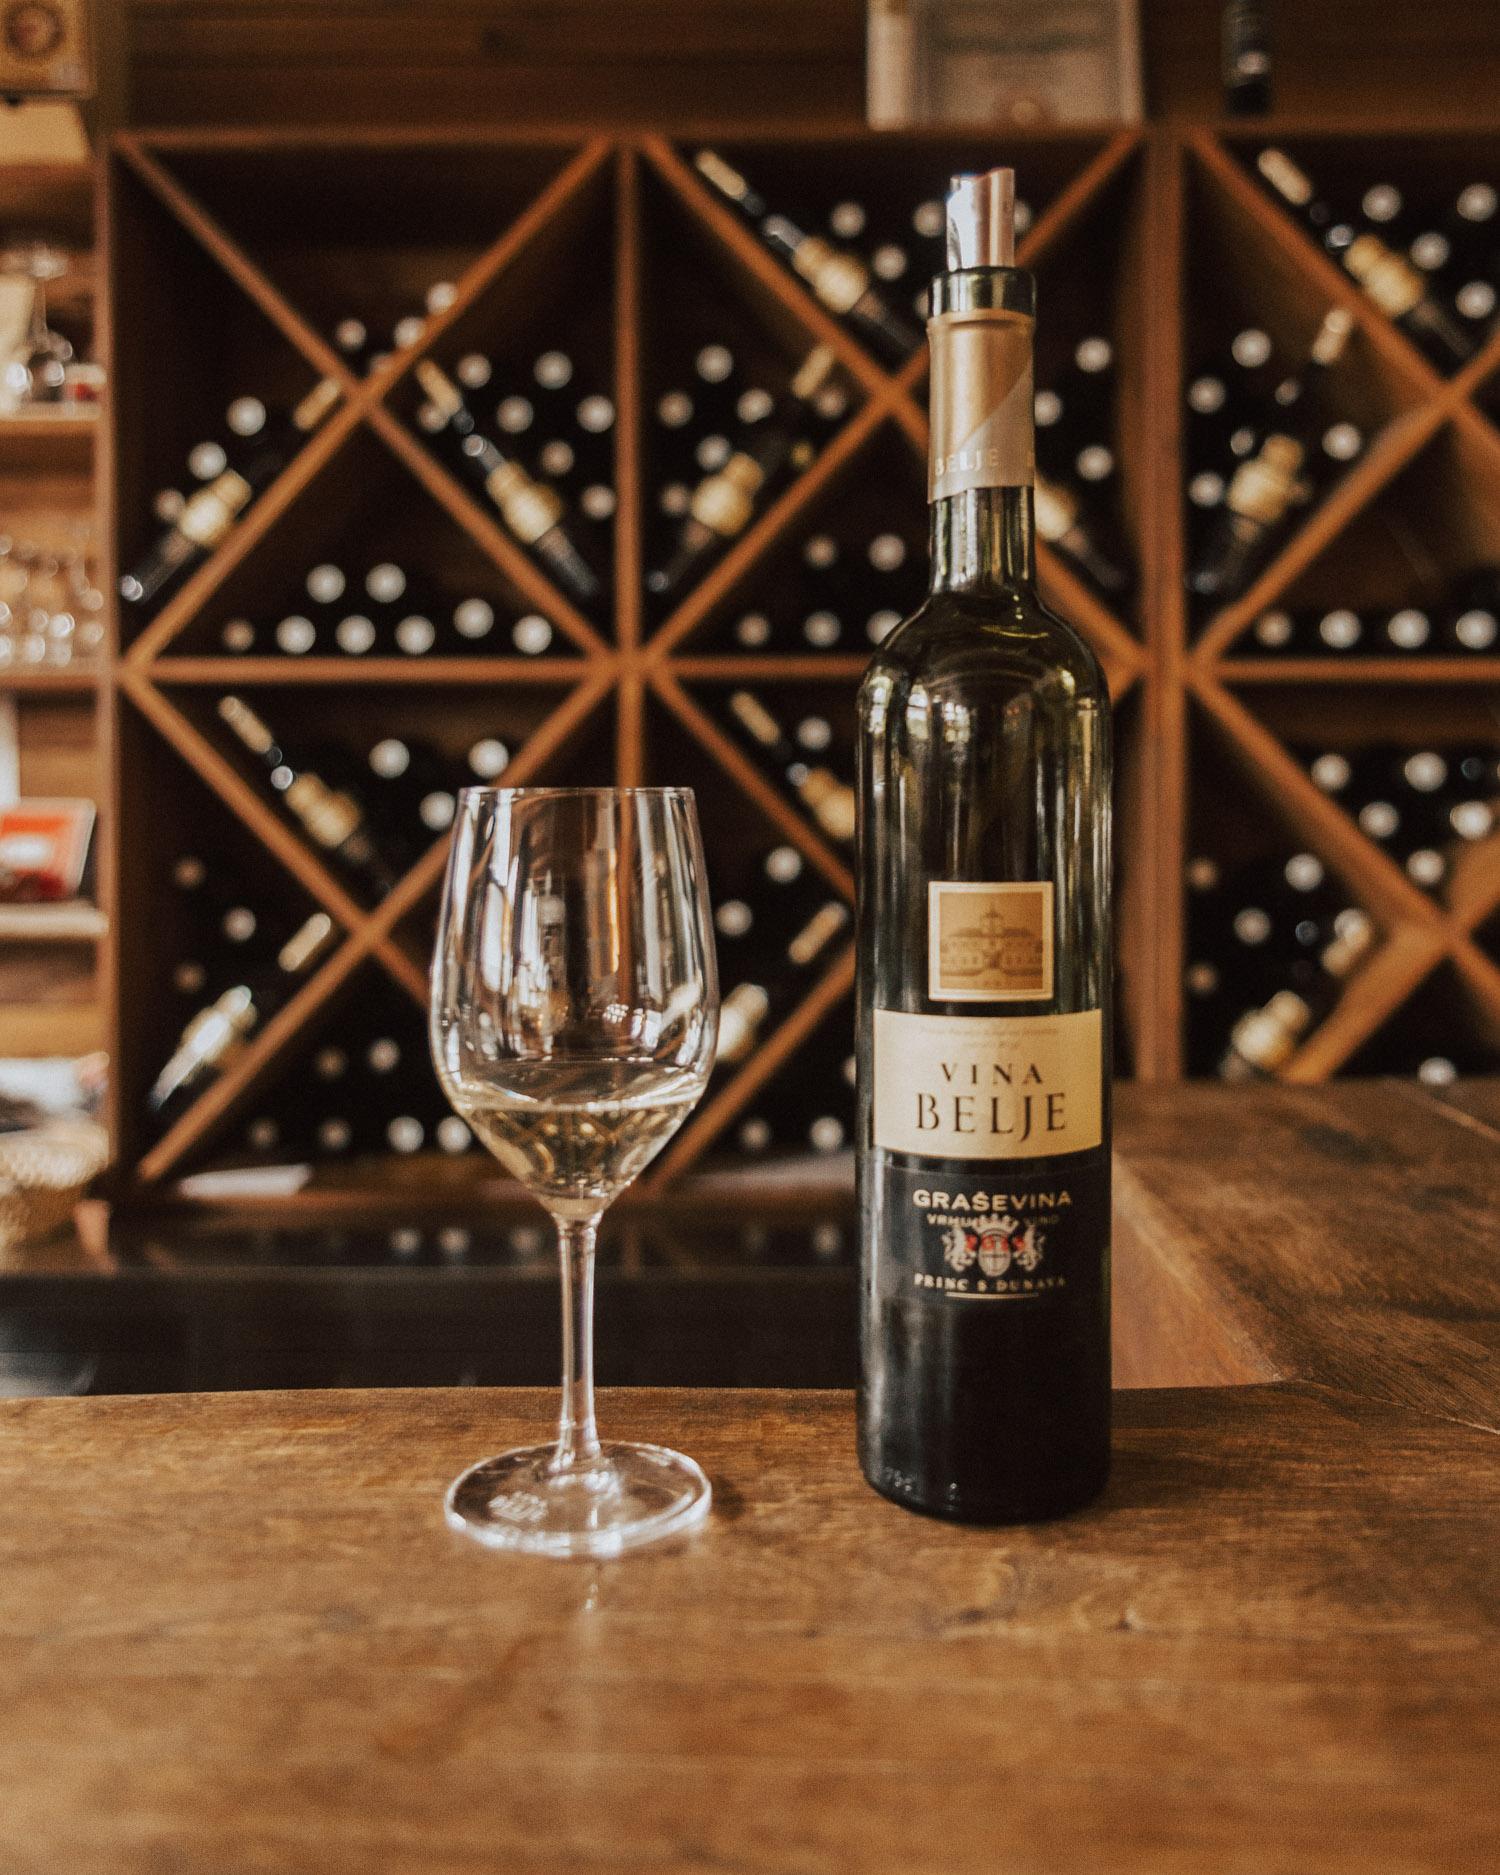 Vina Belje Croatian Wine